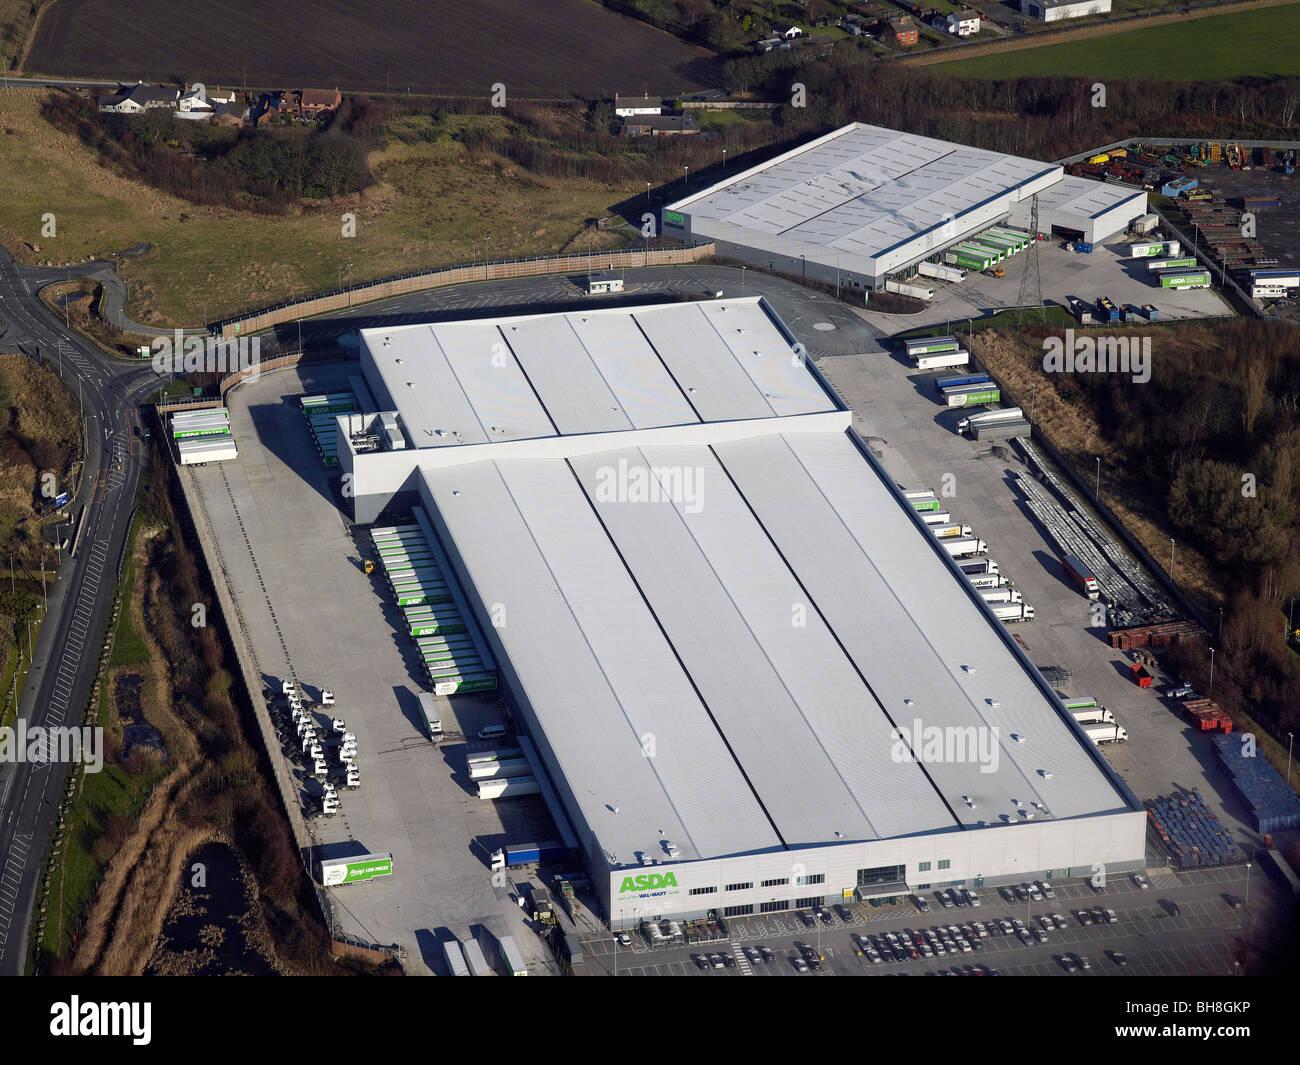 Retail Distribution Warehouse at Wigan, Lancashire, Northern England - Stock Image